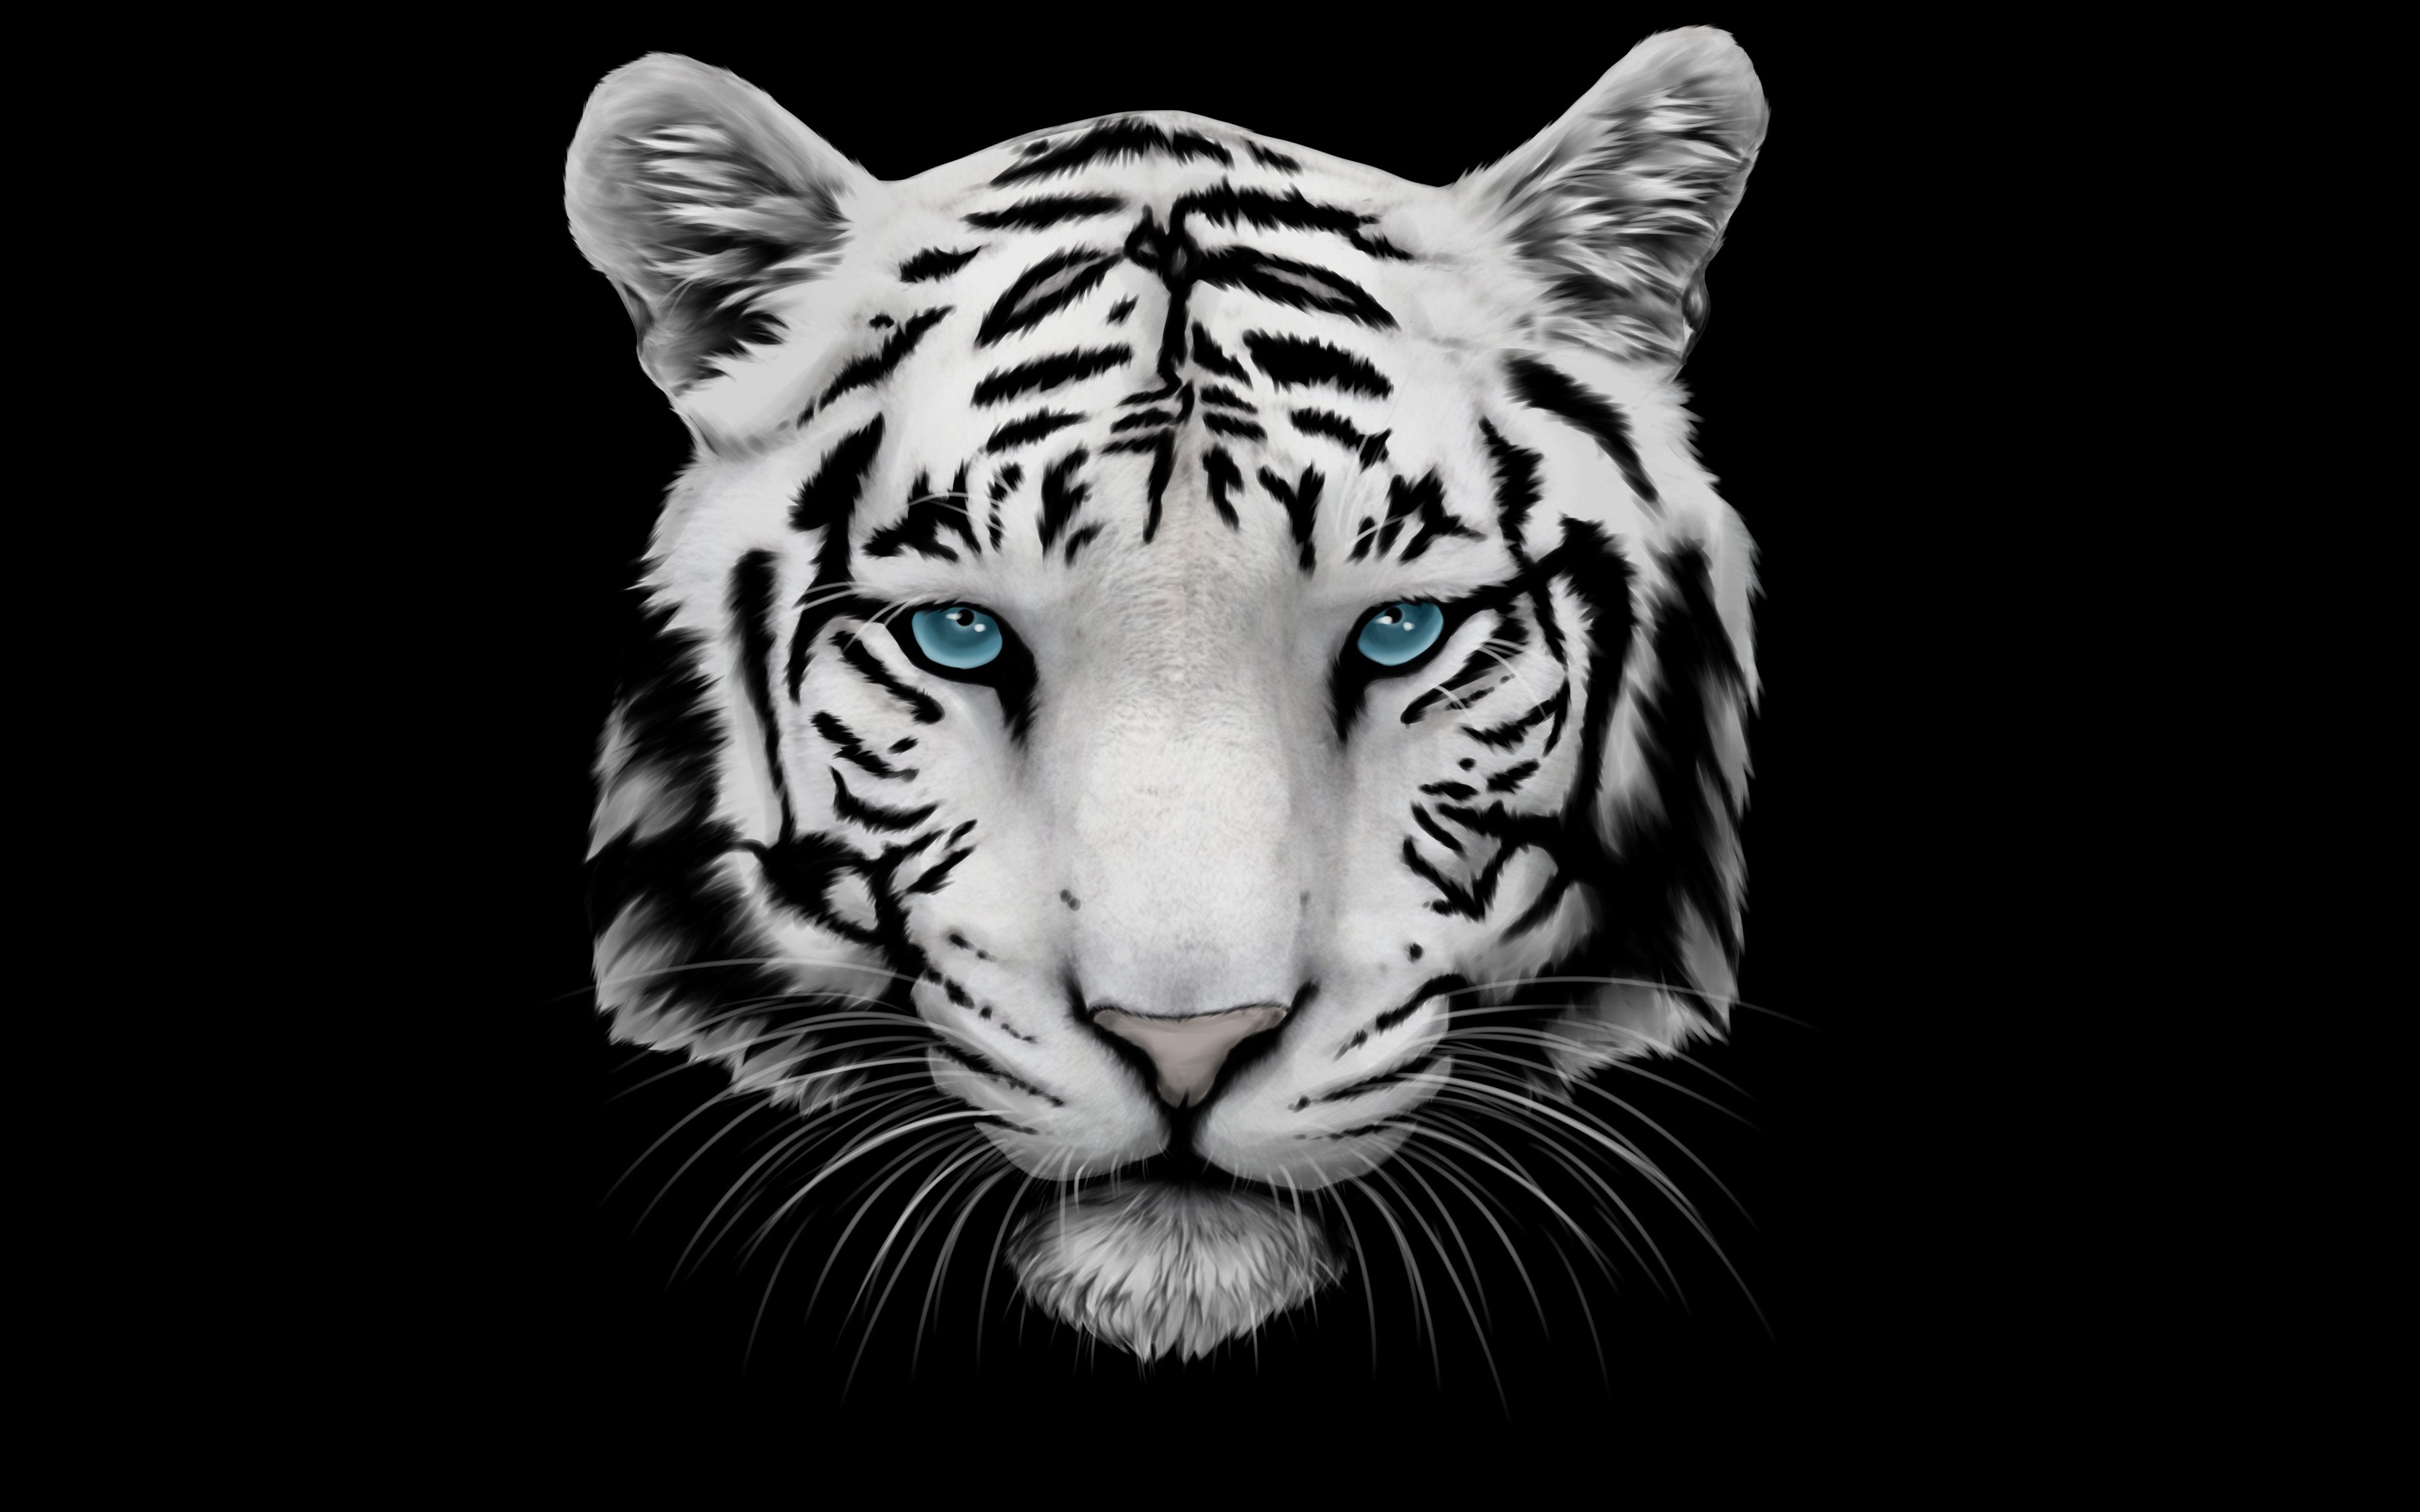 White Tiger Wallpaper High Definition Tiger wallpaper